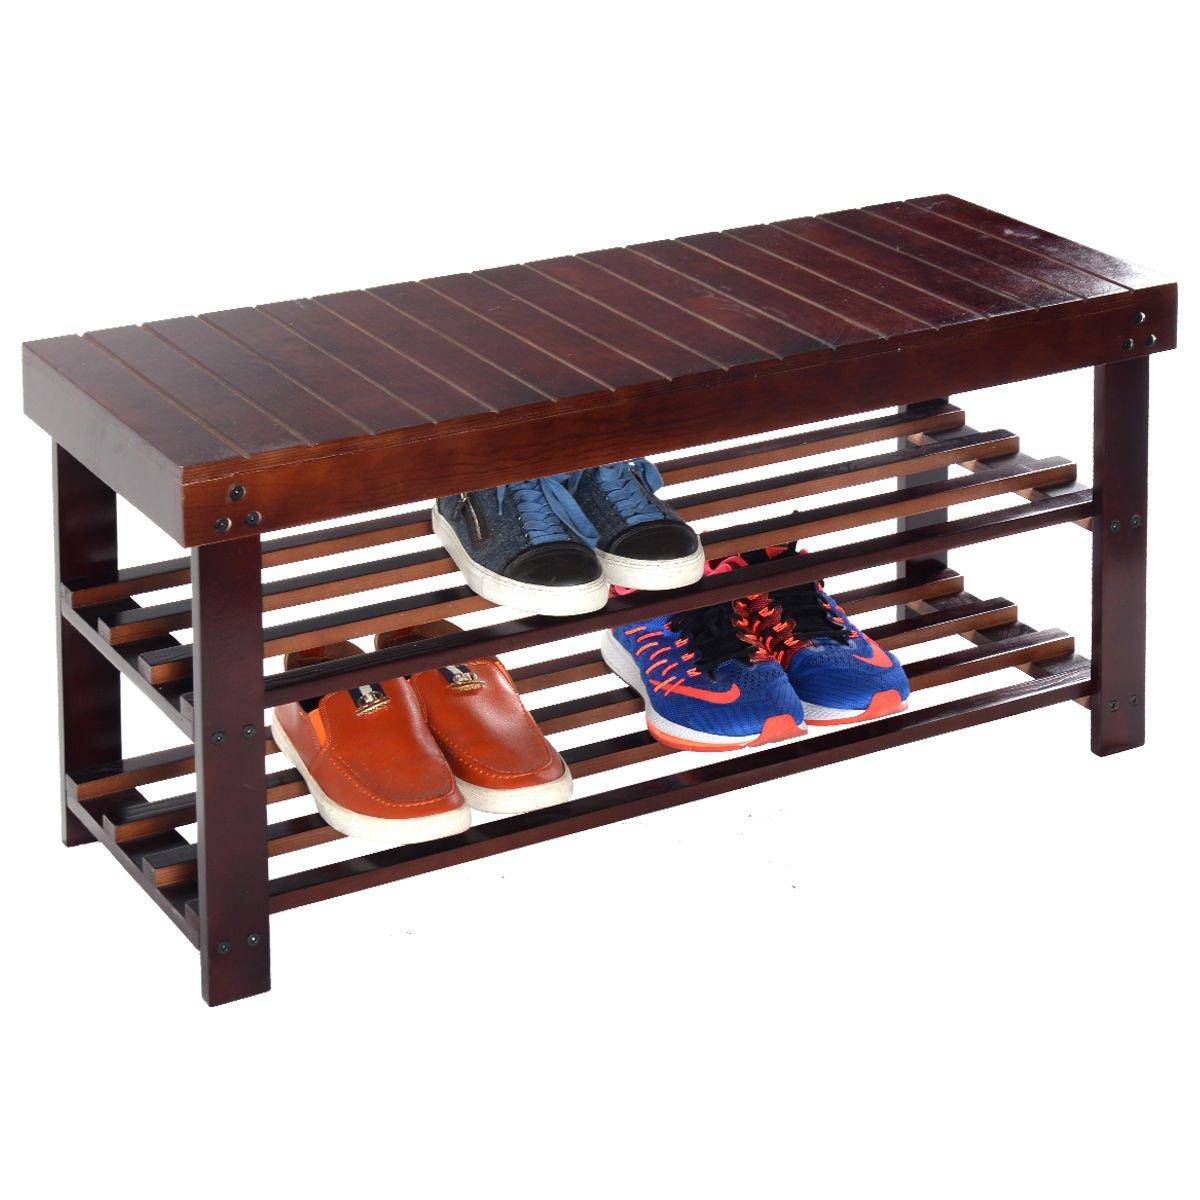 New MTN-G 36'' Solid Wood Shoe Bench Storage Racks Seat Organizer Entryway Hallway Espresso